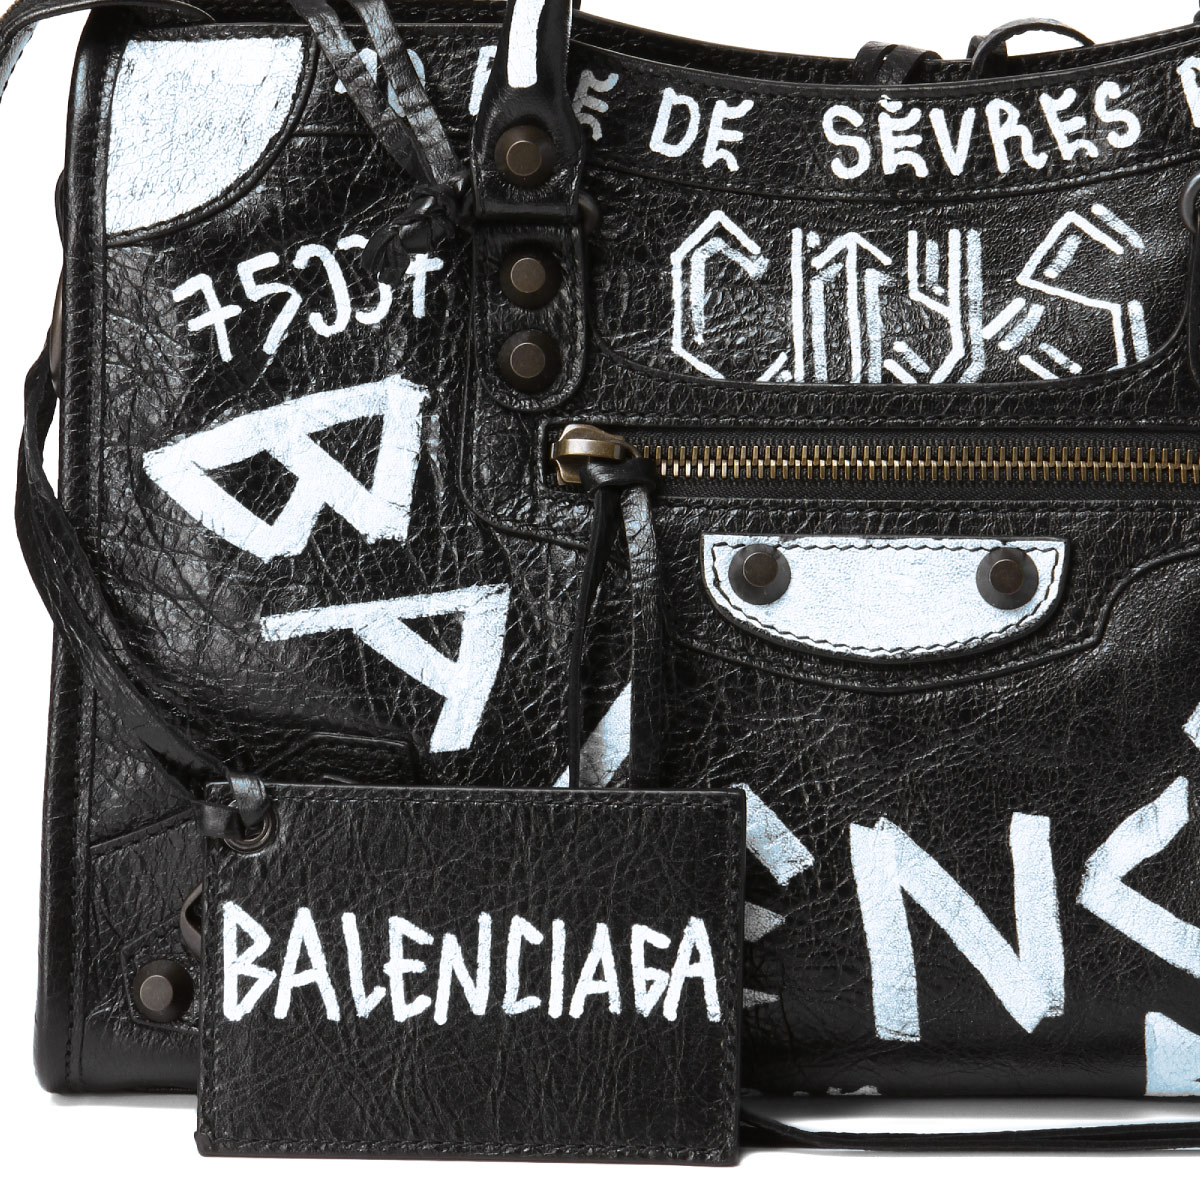 7014fbc90cde 431621 バレンシアガ balenciaga bag lady 0fe1t 1090 shoulders handbag small graffiti  classic city graffiti classical music